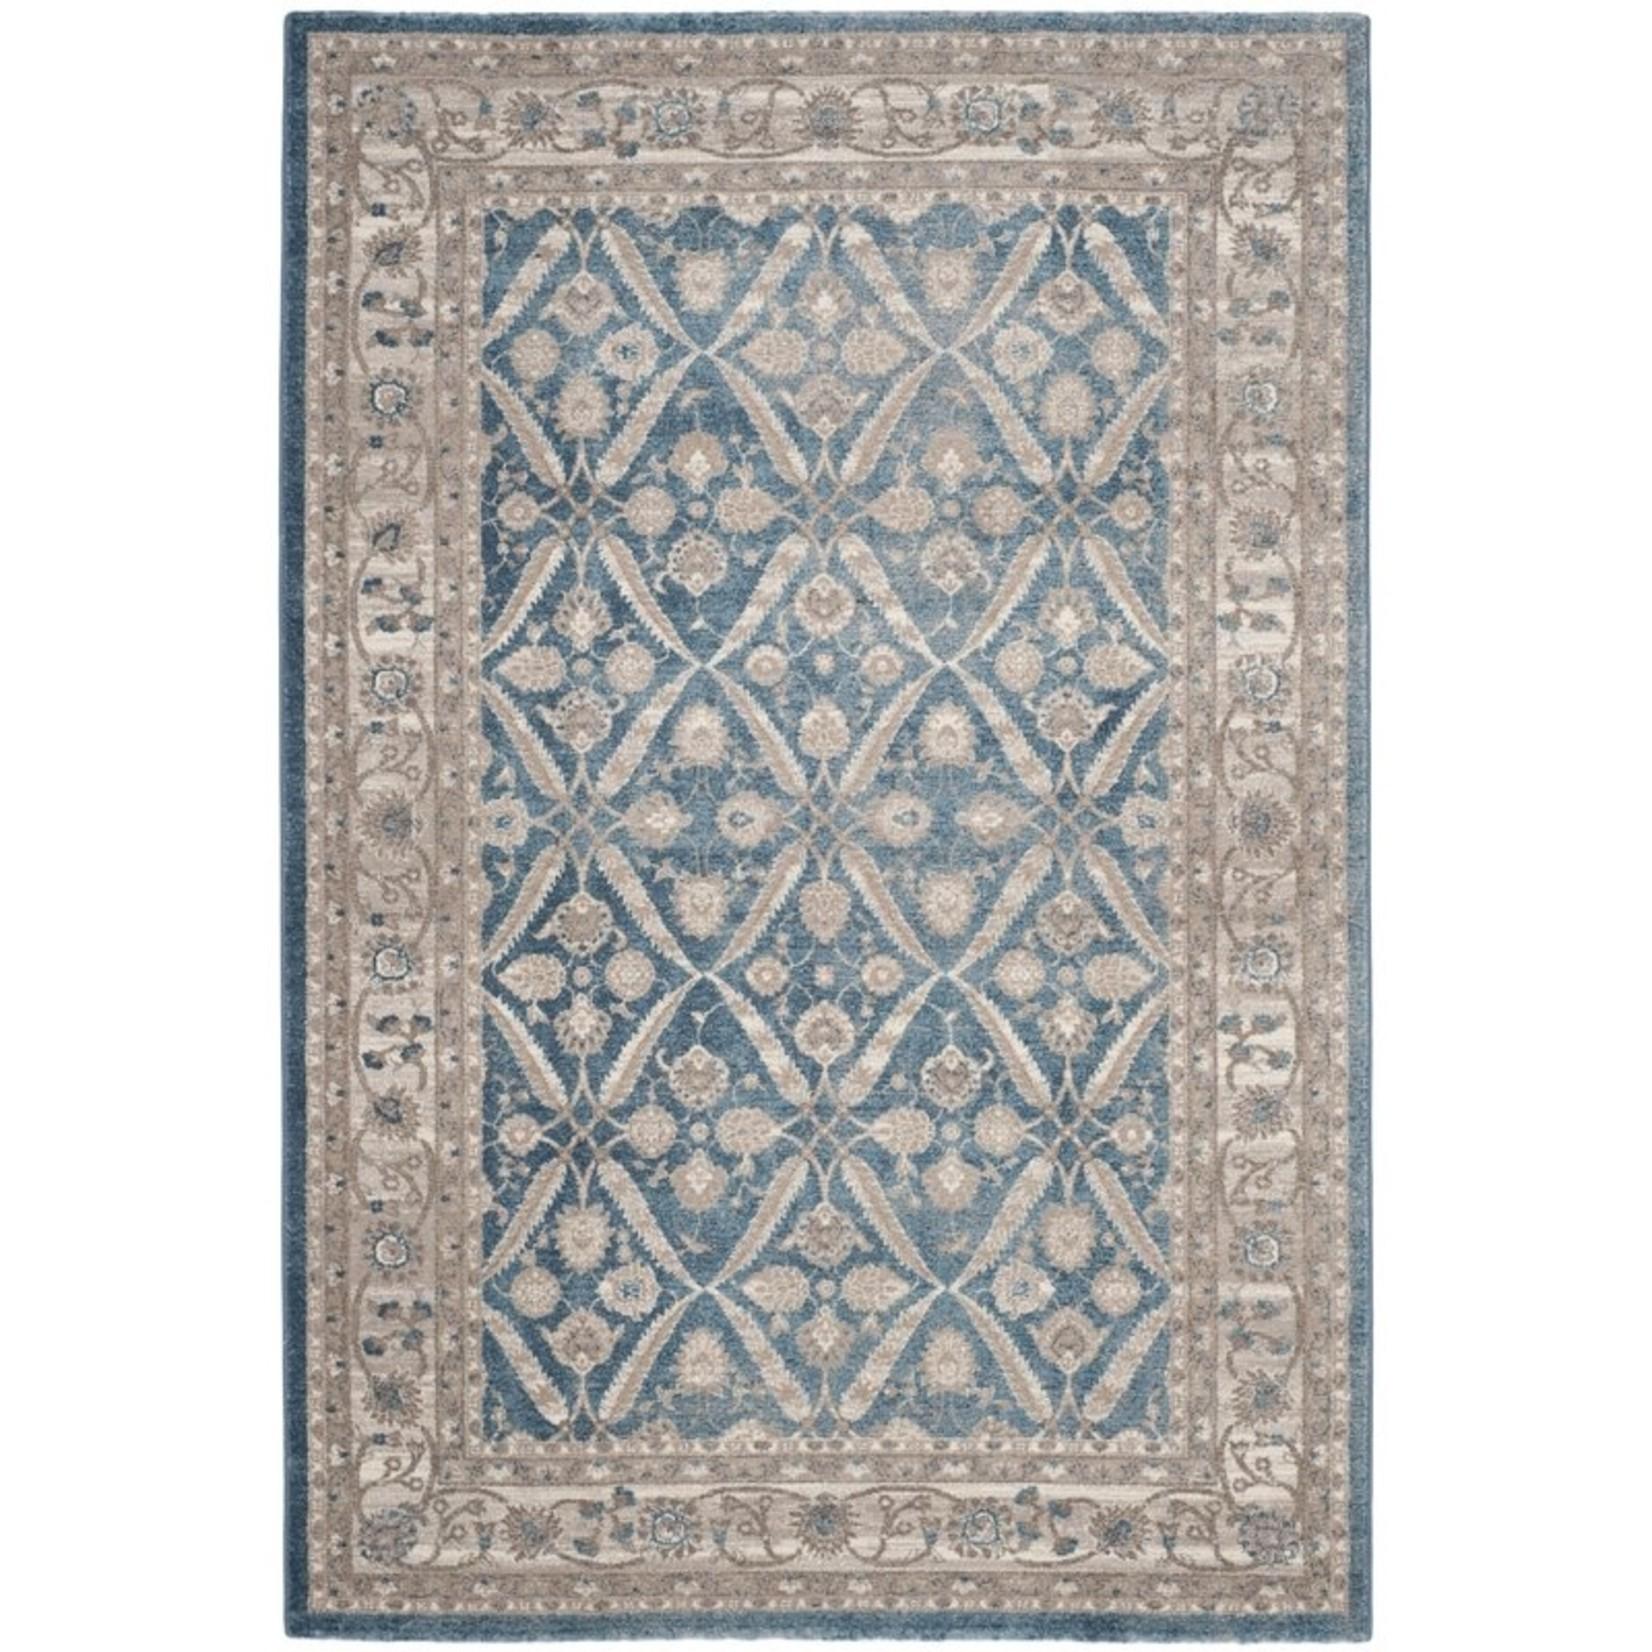 *8' x 10' - Statham Oriental Blue/Beige Area Rug